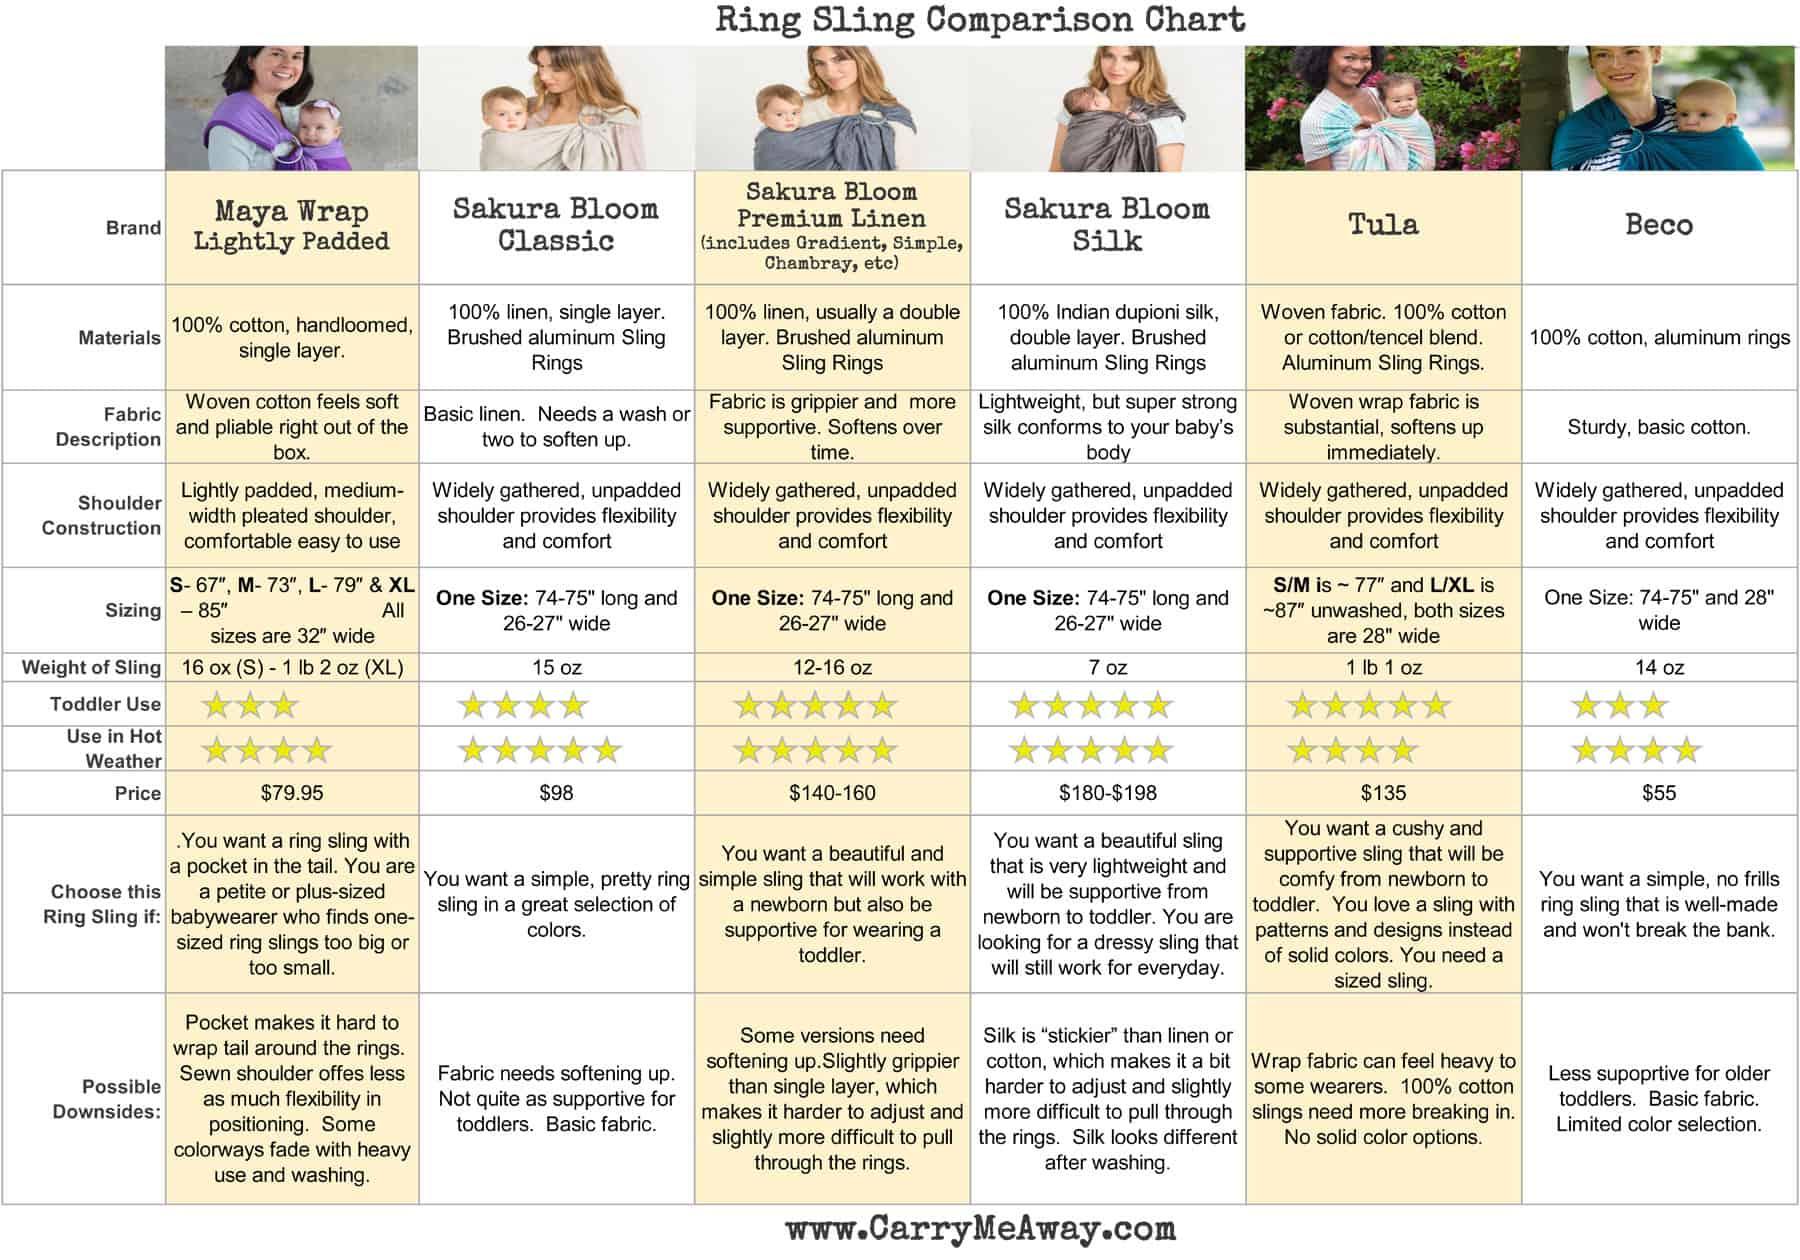 Maya Wrap | Sakura Bloom | Tula Ring Sling | Beco Ring Sling | Ring Sling Comparison Chart